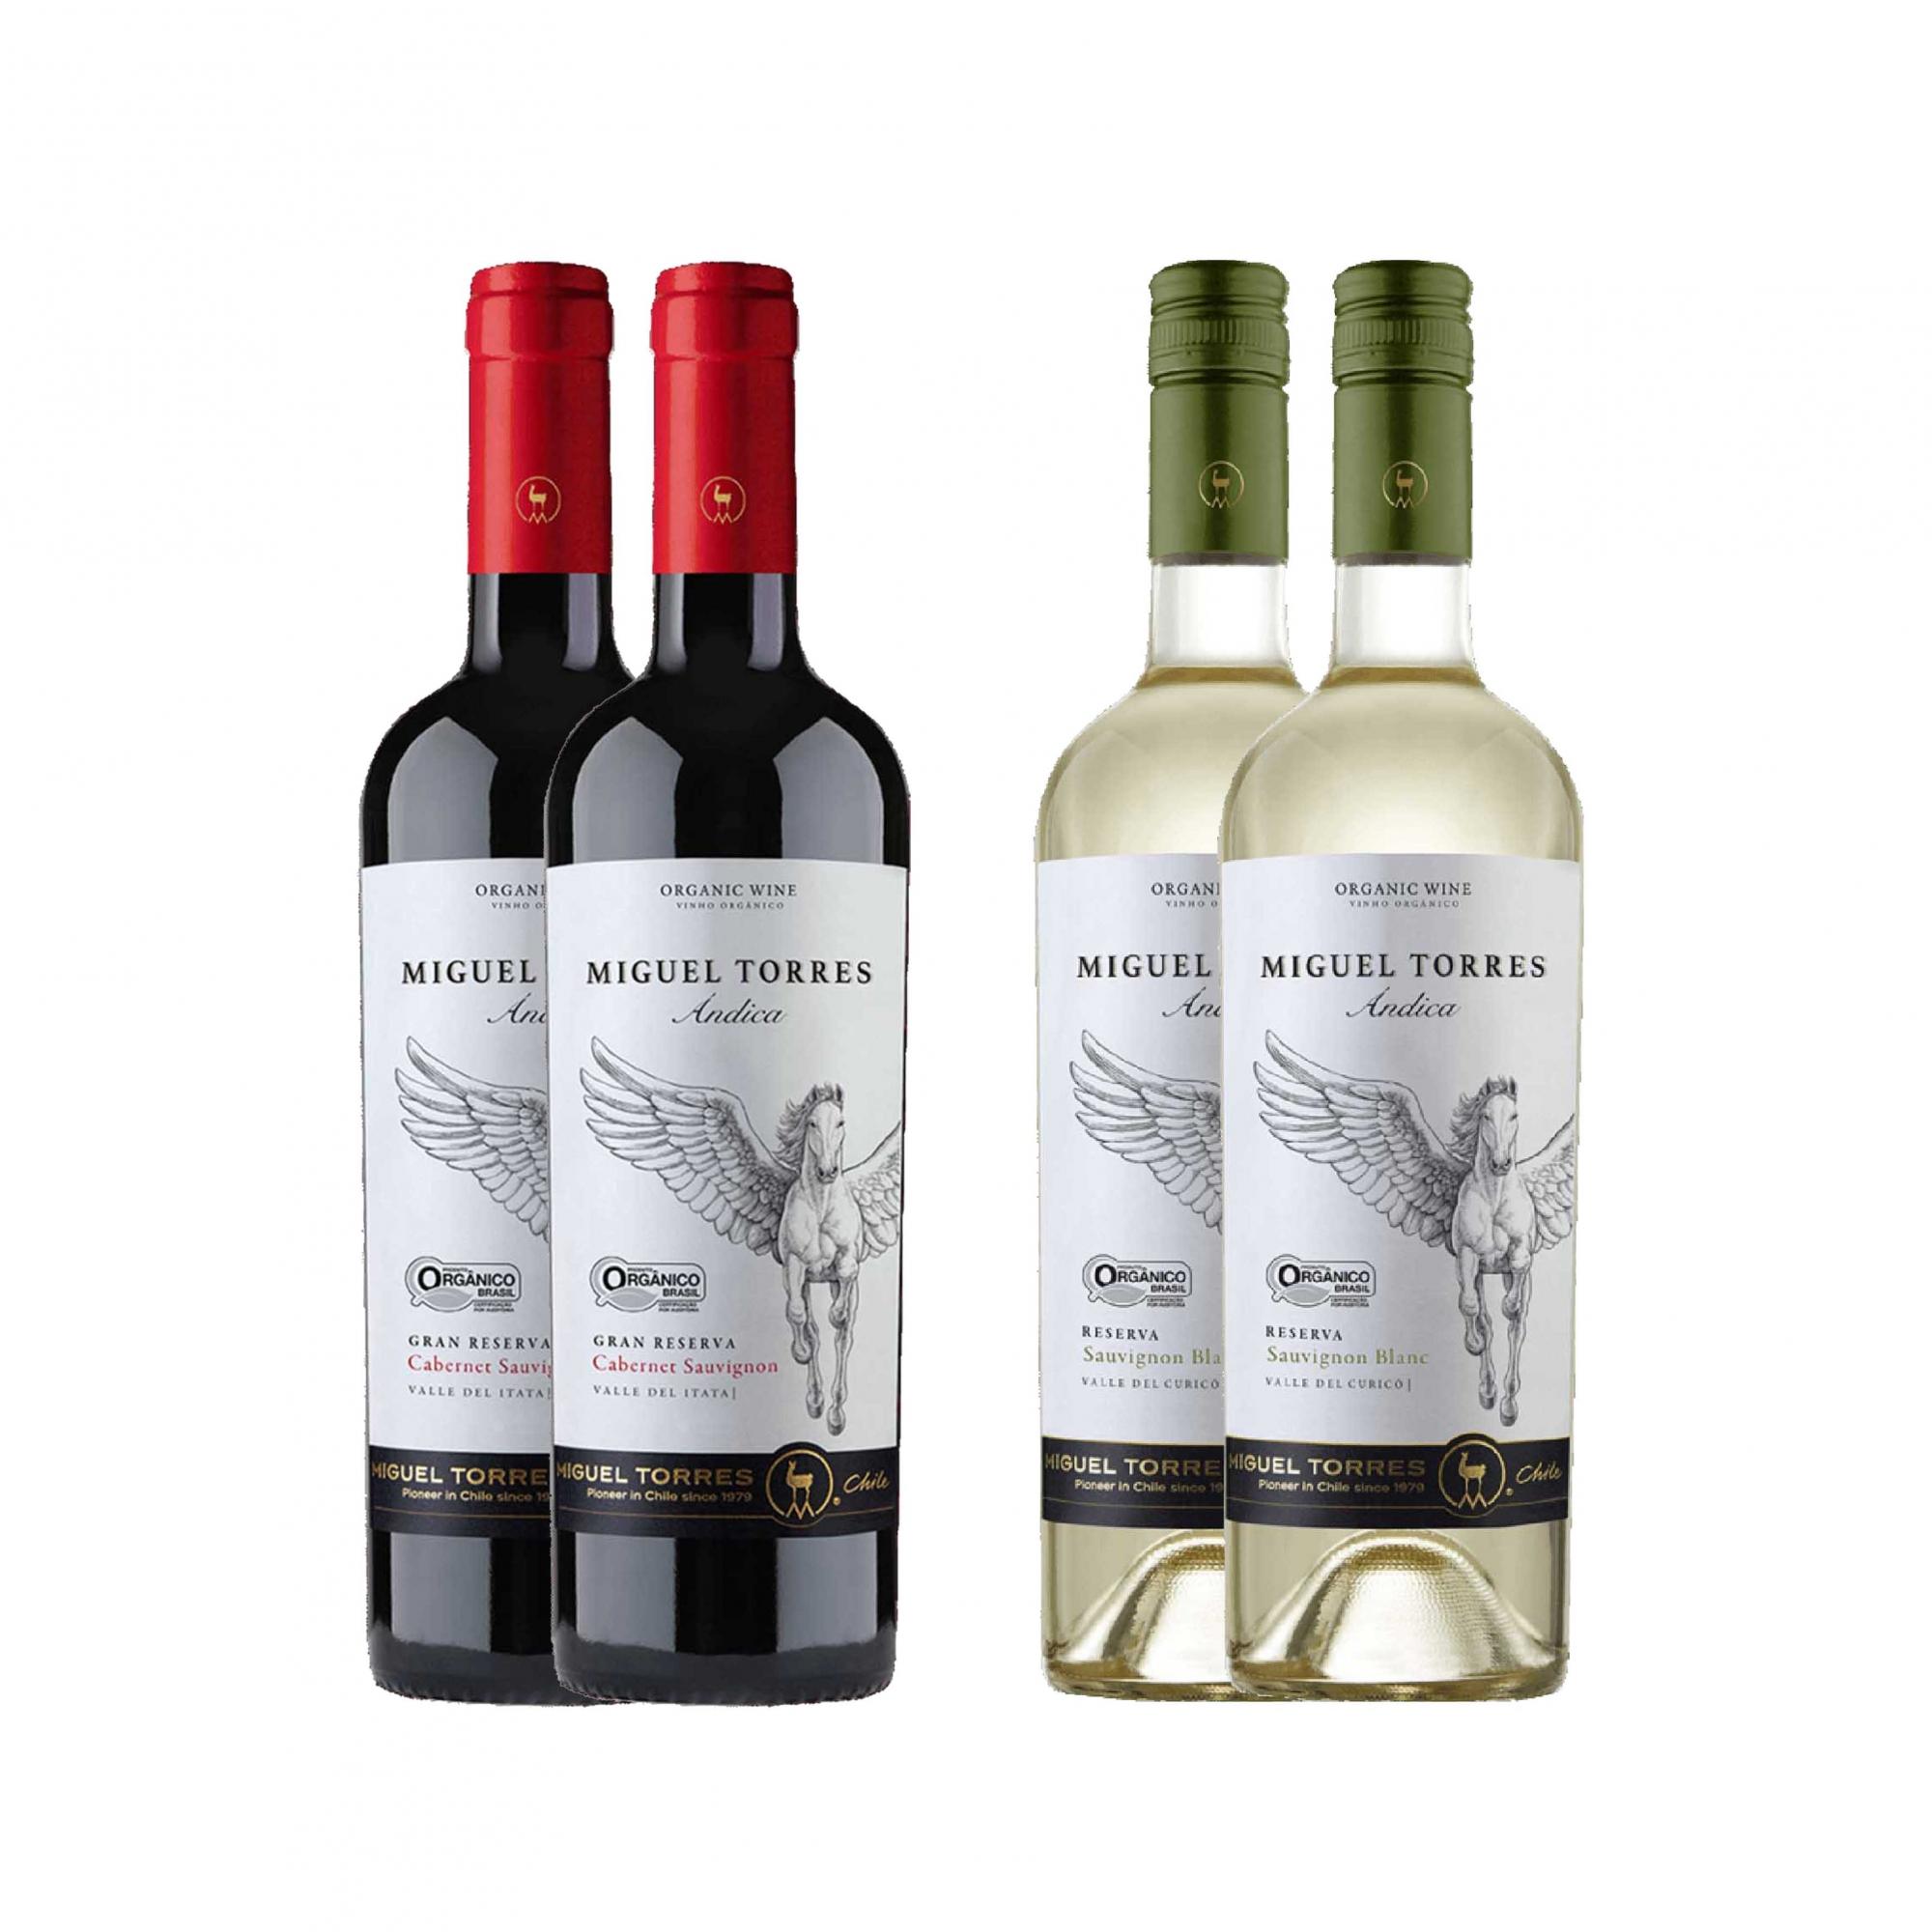 Kit 4x Vinho Tinto Chileno Orgânico Miguel Torres Cabernet Sauvignon e Sauvignon Blanc 2019